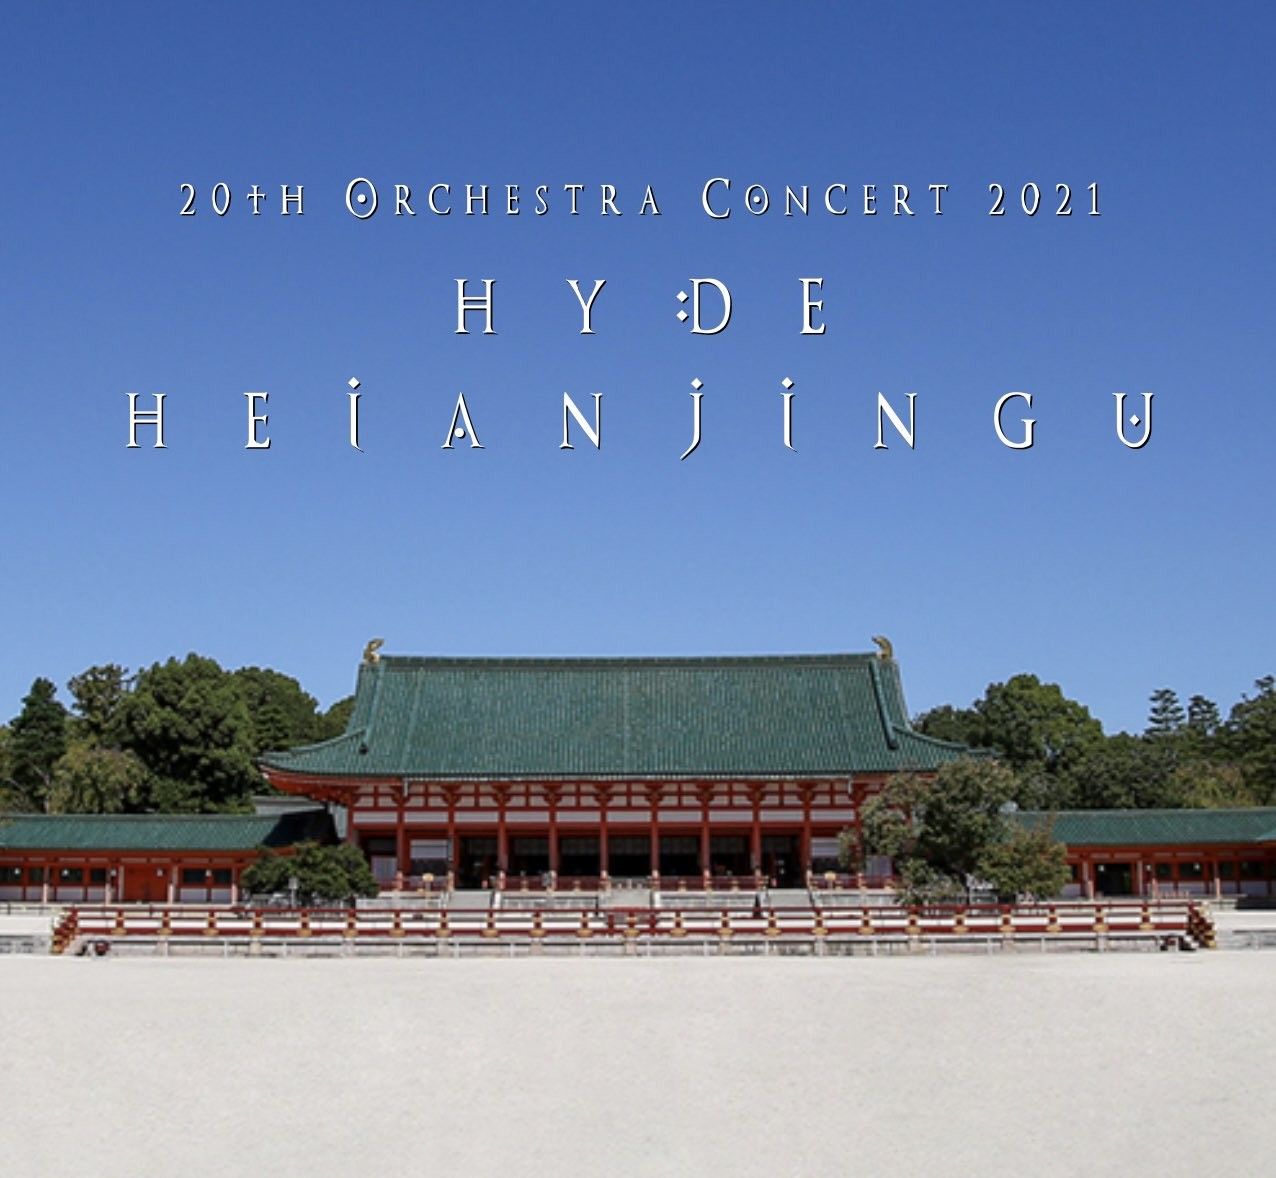 HYDE – 20th Orchestra Concert 2021 HYDE HEIANJINGU [MP4 1080p / WEB] (2021.08.01)